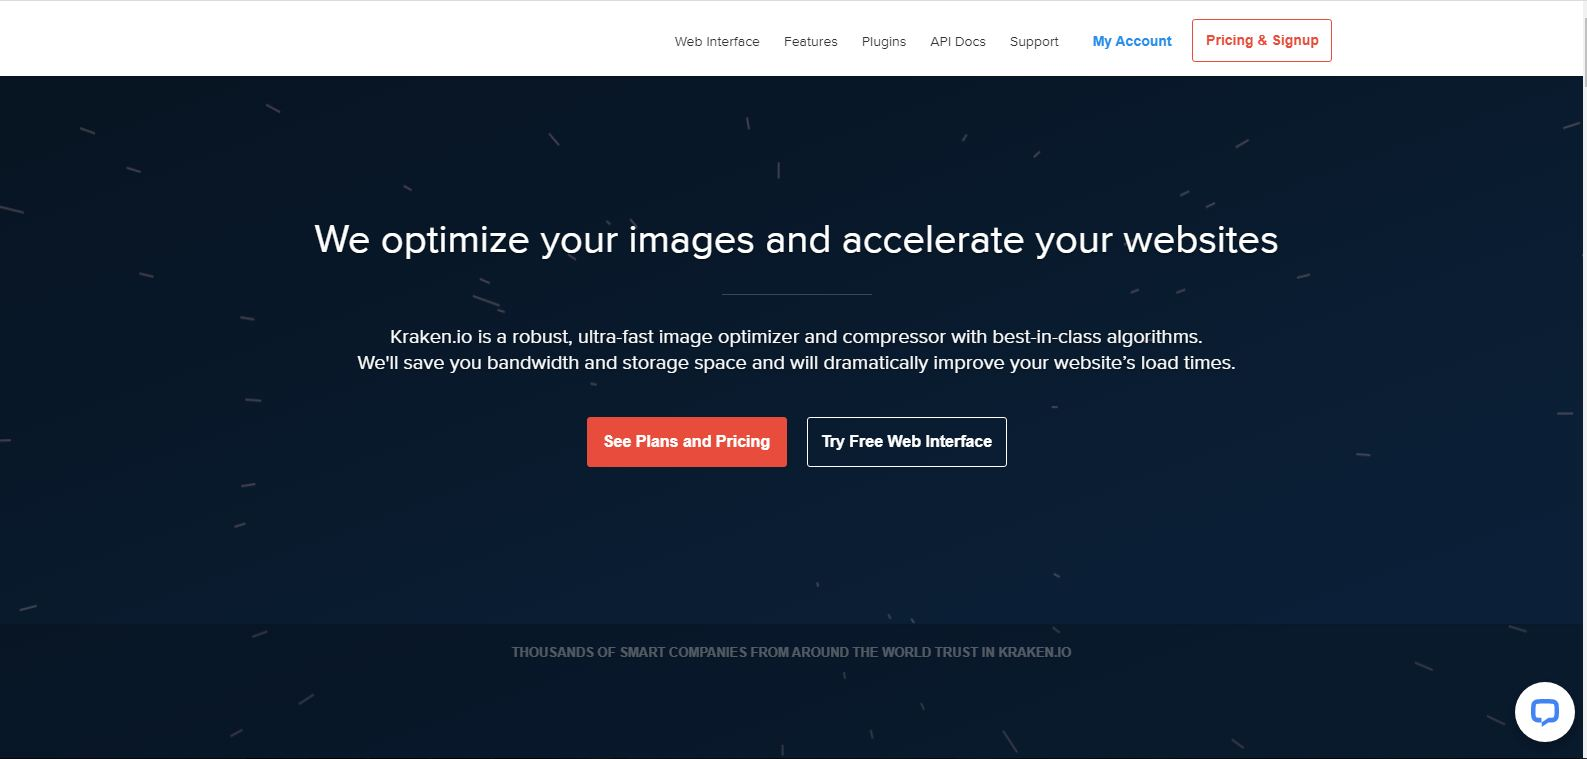 kraken.io online image compression tool